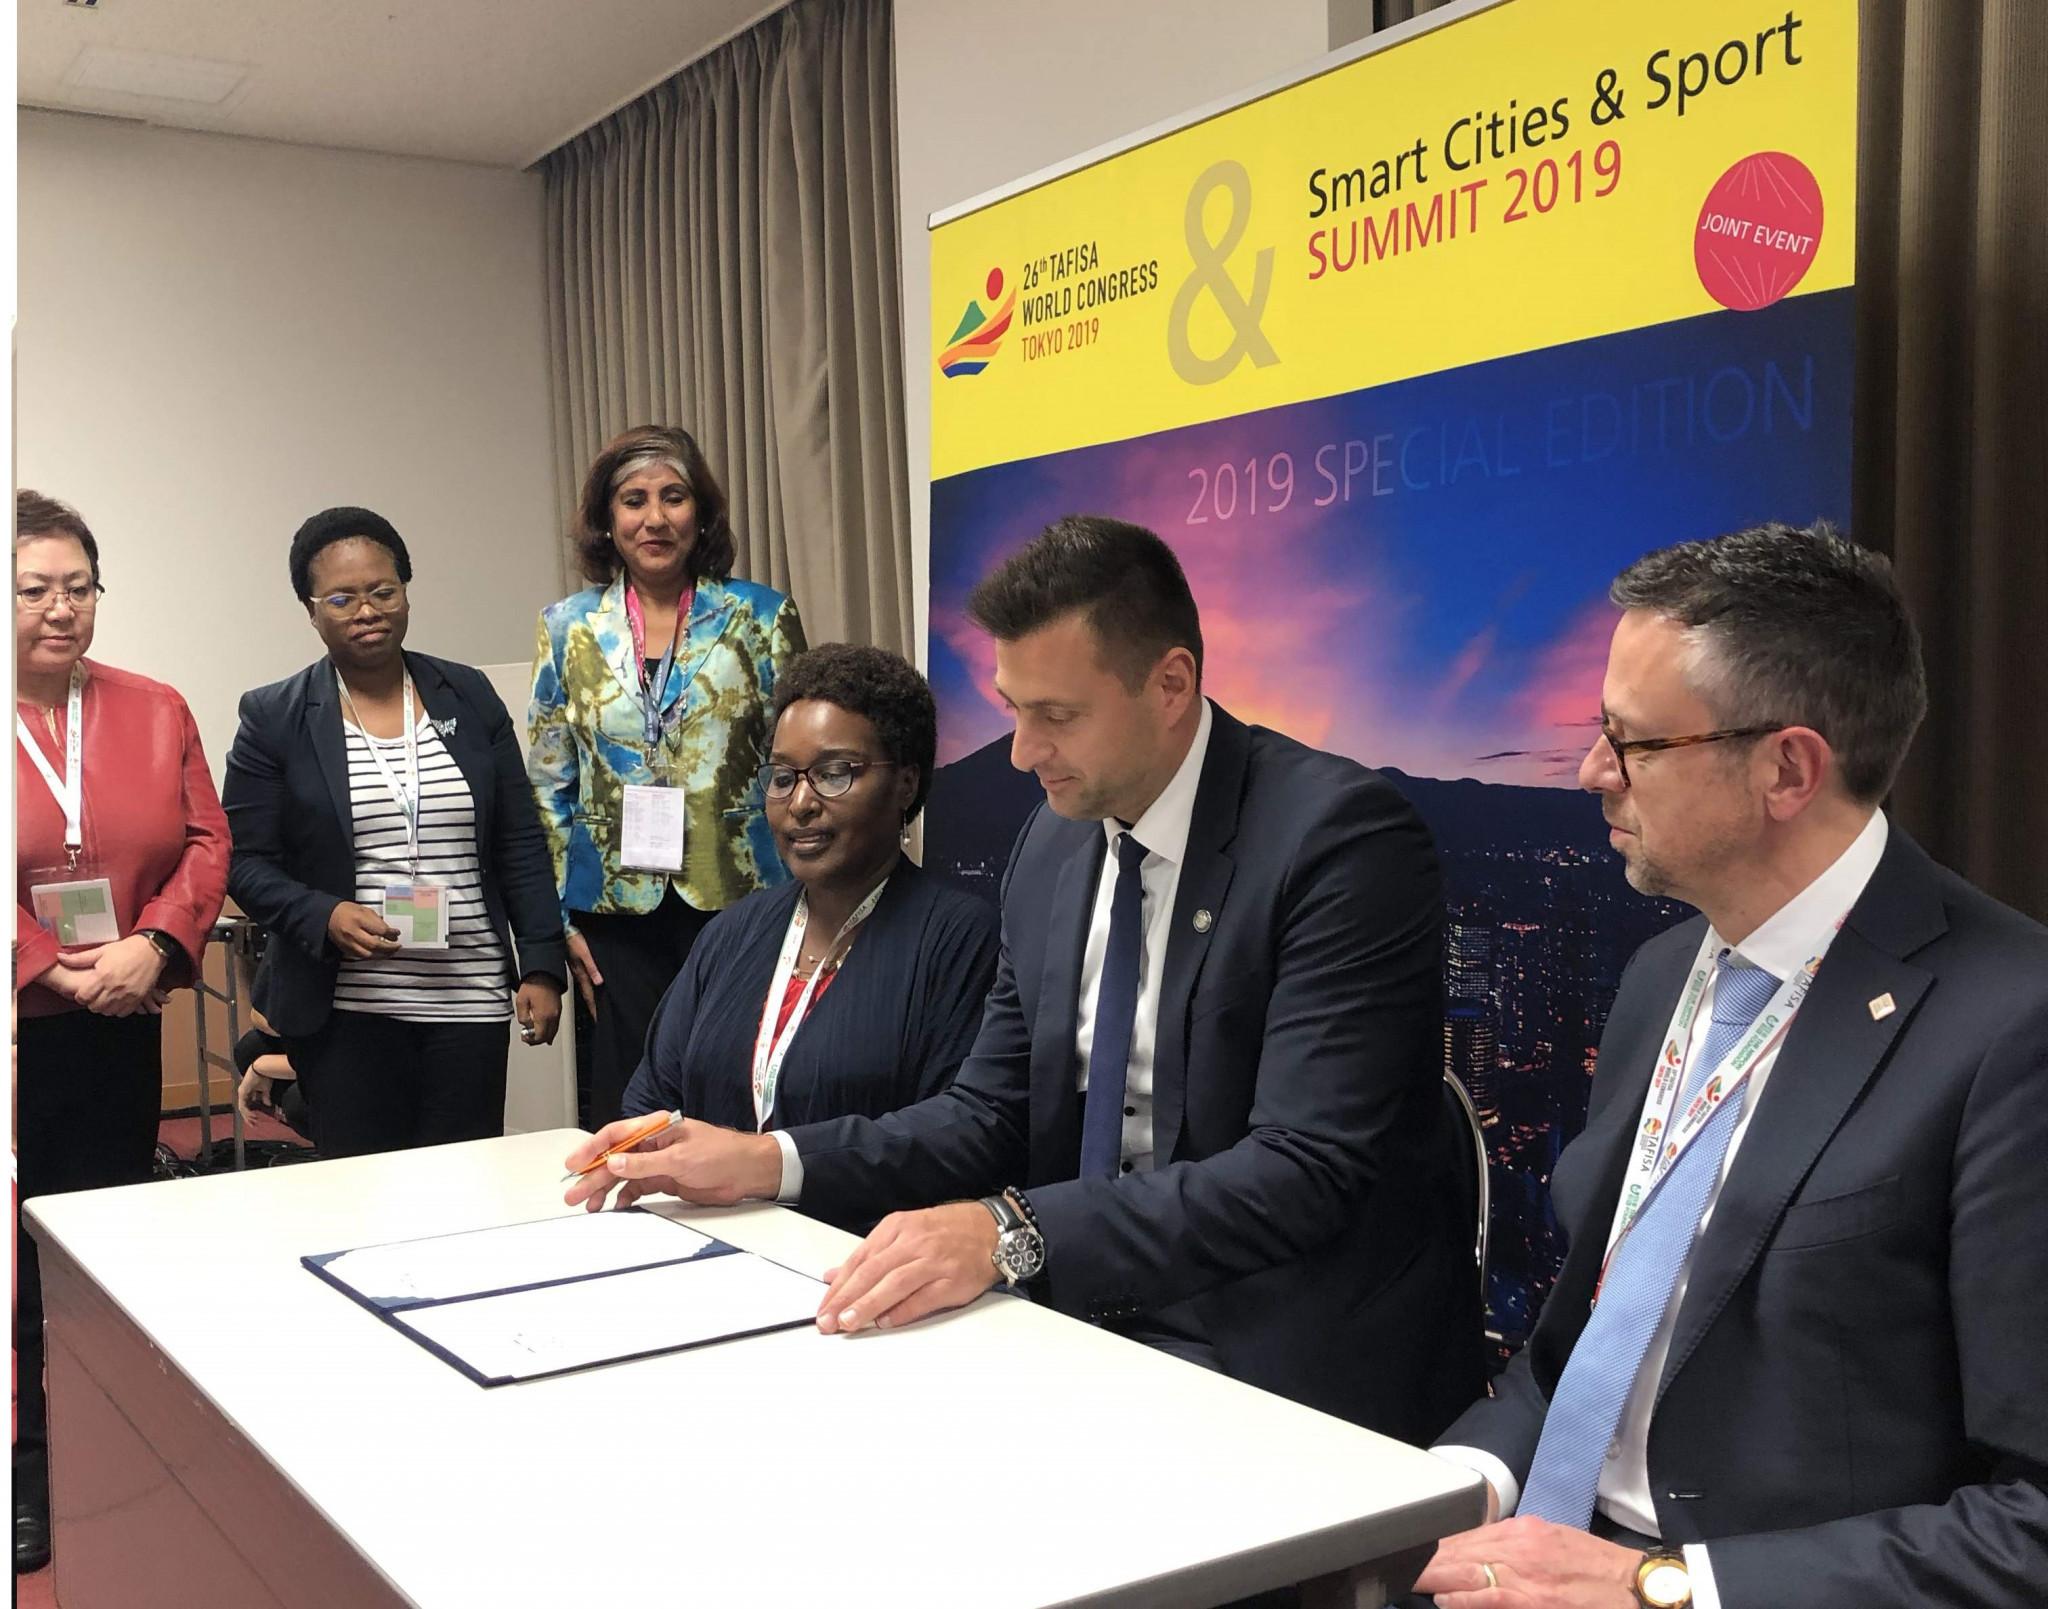 FITEQ sign Brighton plus Helsinki Declaration on Women and Sport